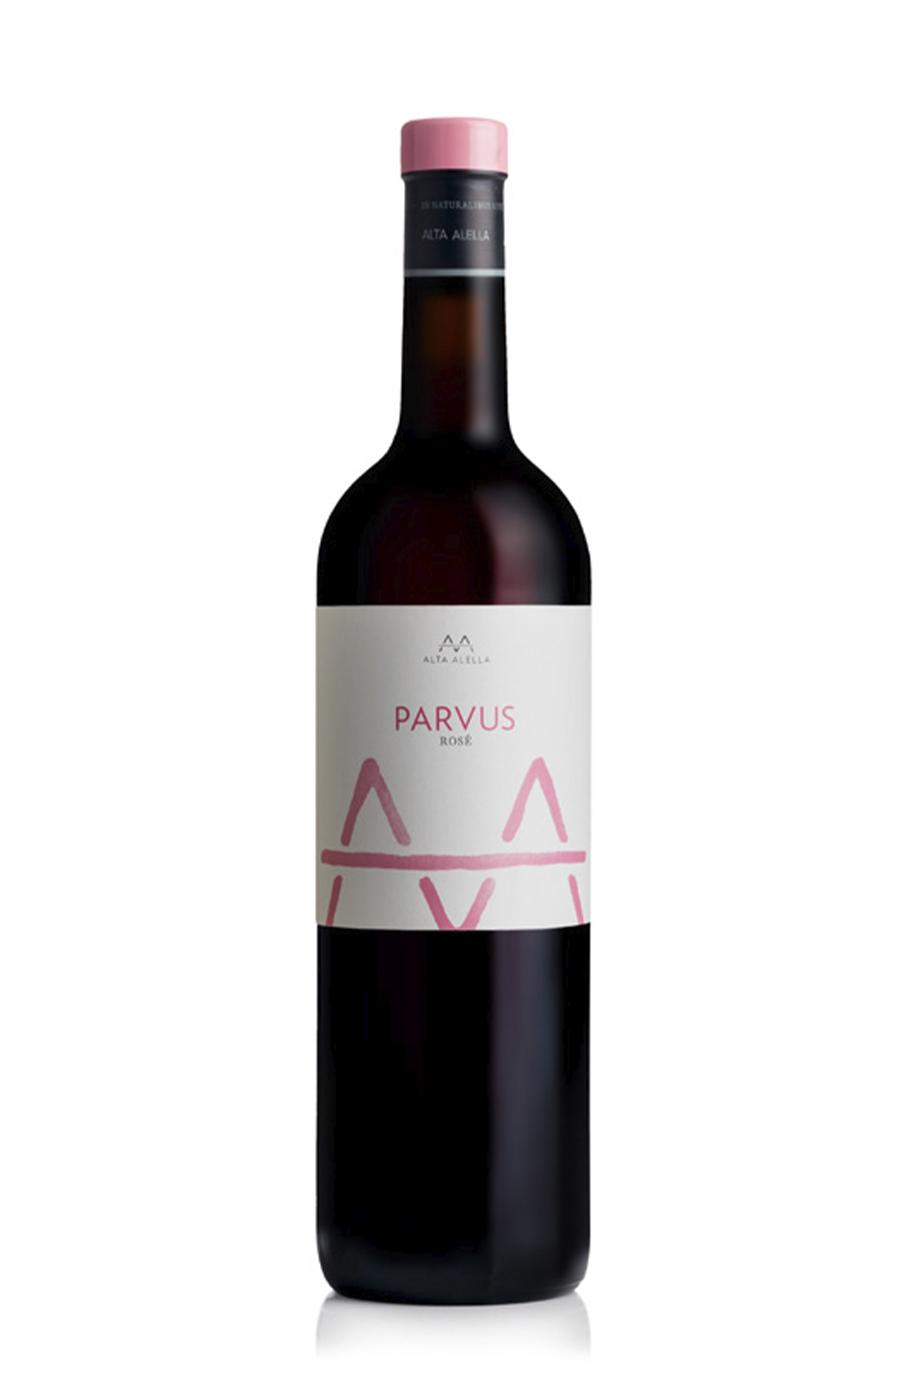 AA Parvus Rosé   Alta Alella  - Winexfood